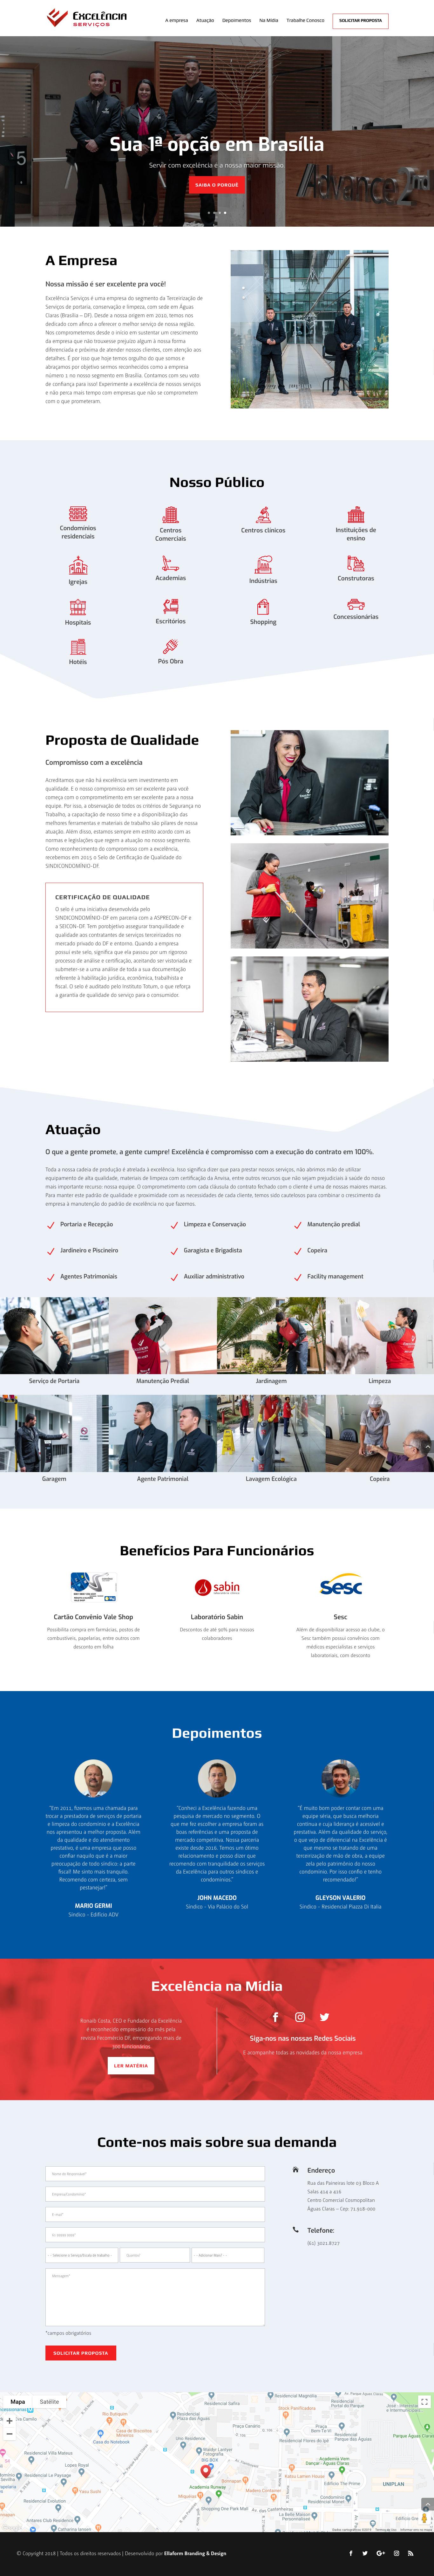 site_excelencia_servicos_01